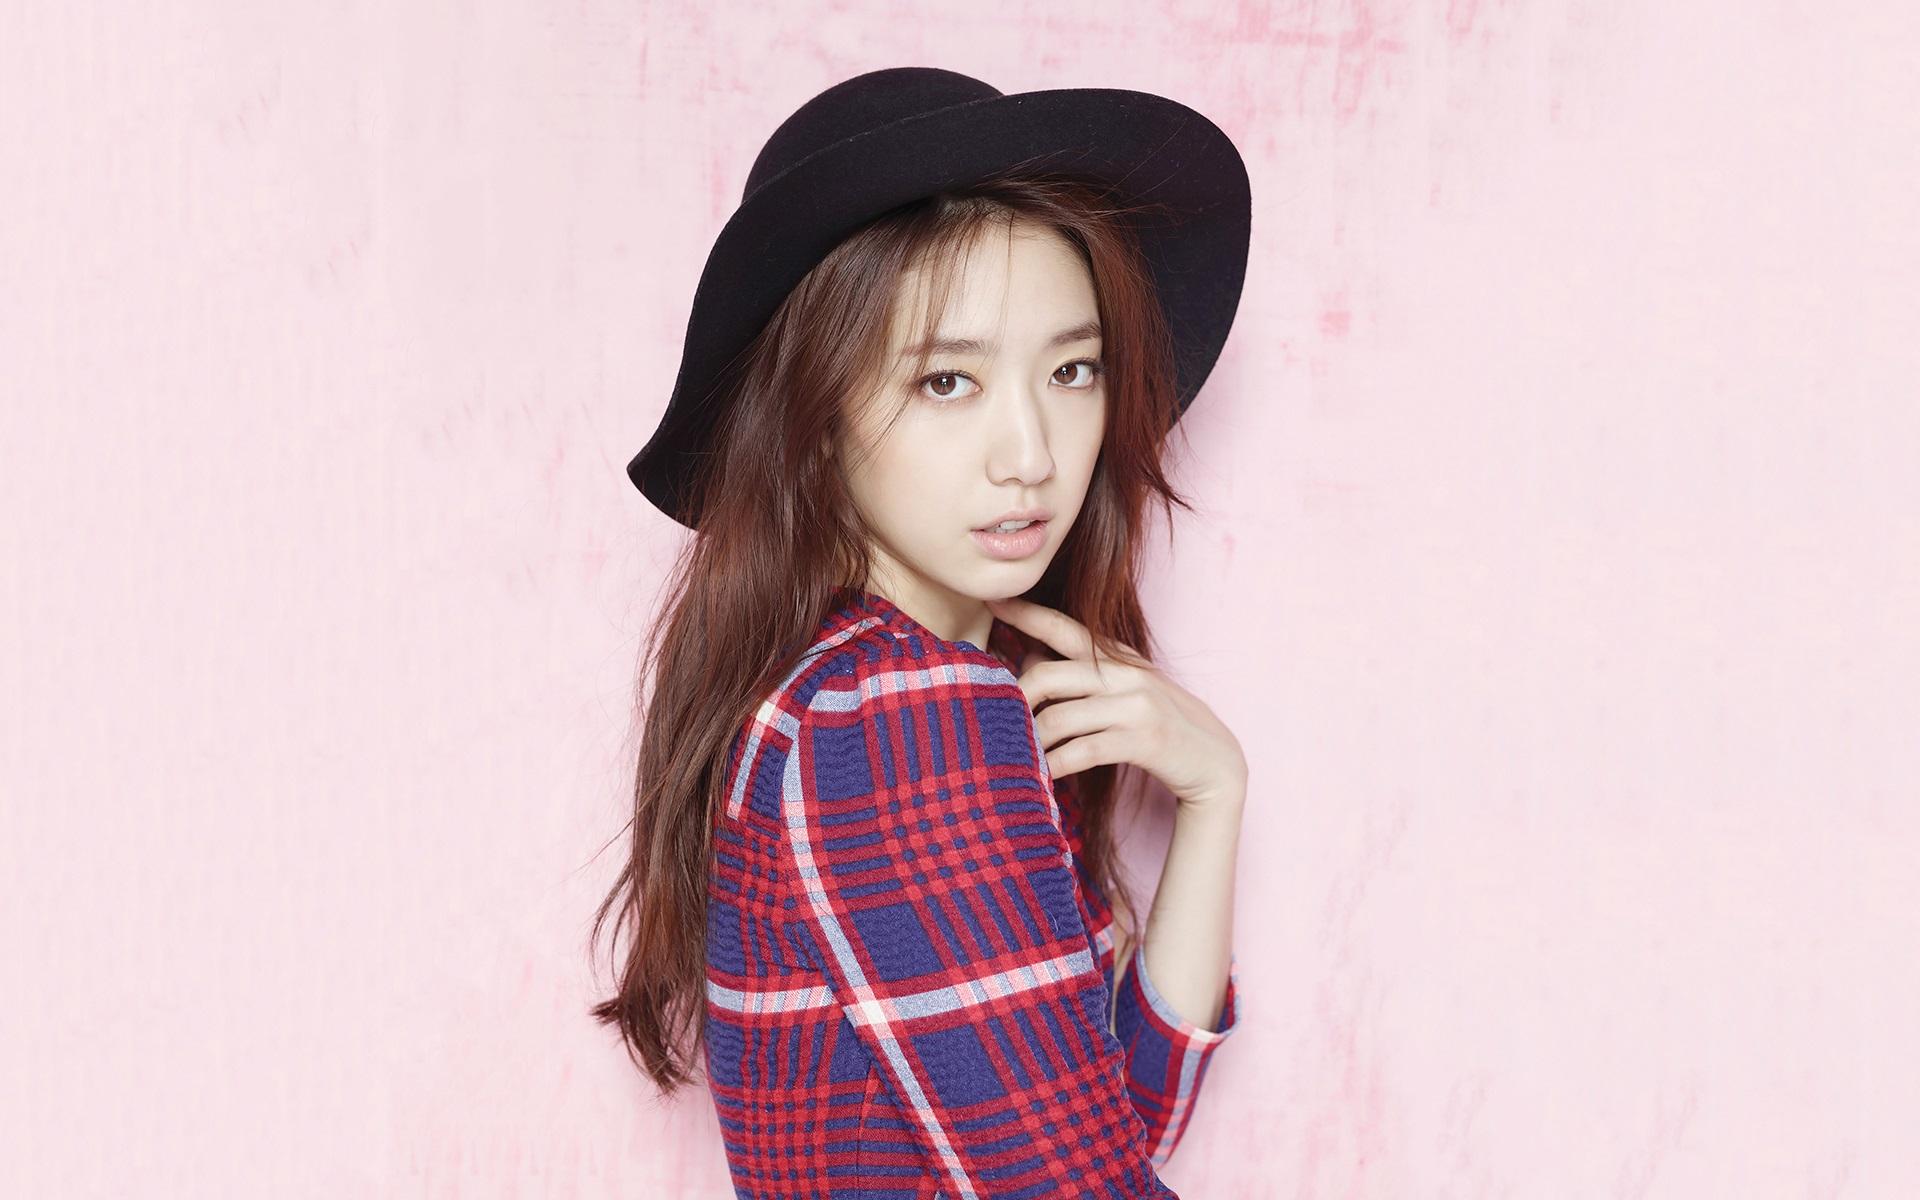 Cute Girl Hd Wallpapers 1080p Download Park Shin Hye 07 Wallpaper Celebrities Wallpaper Better